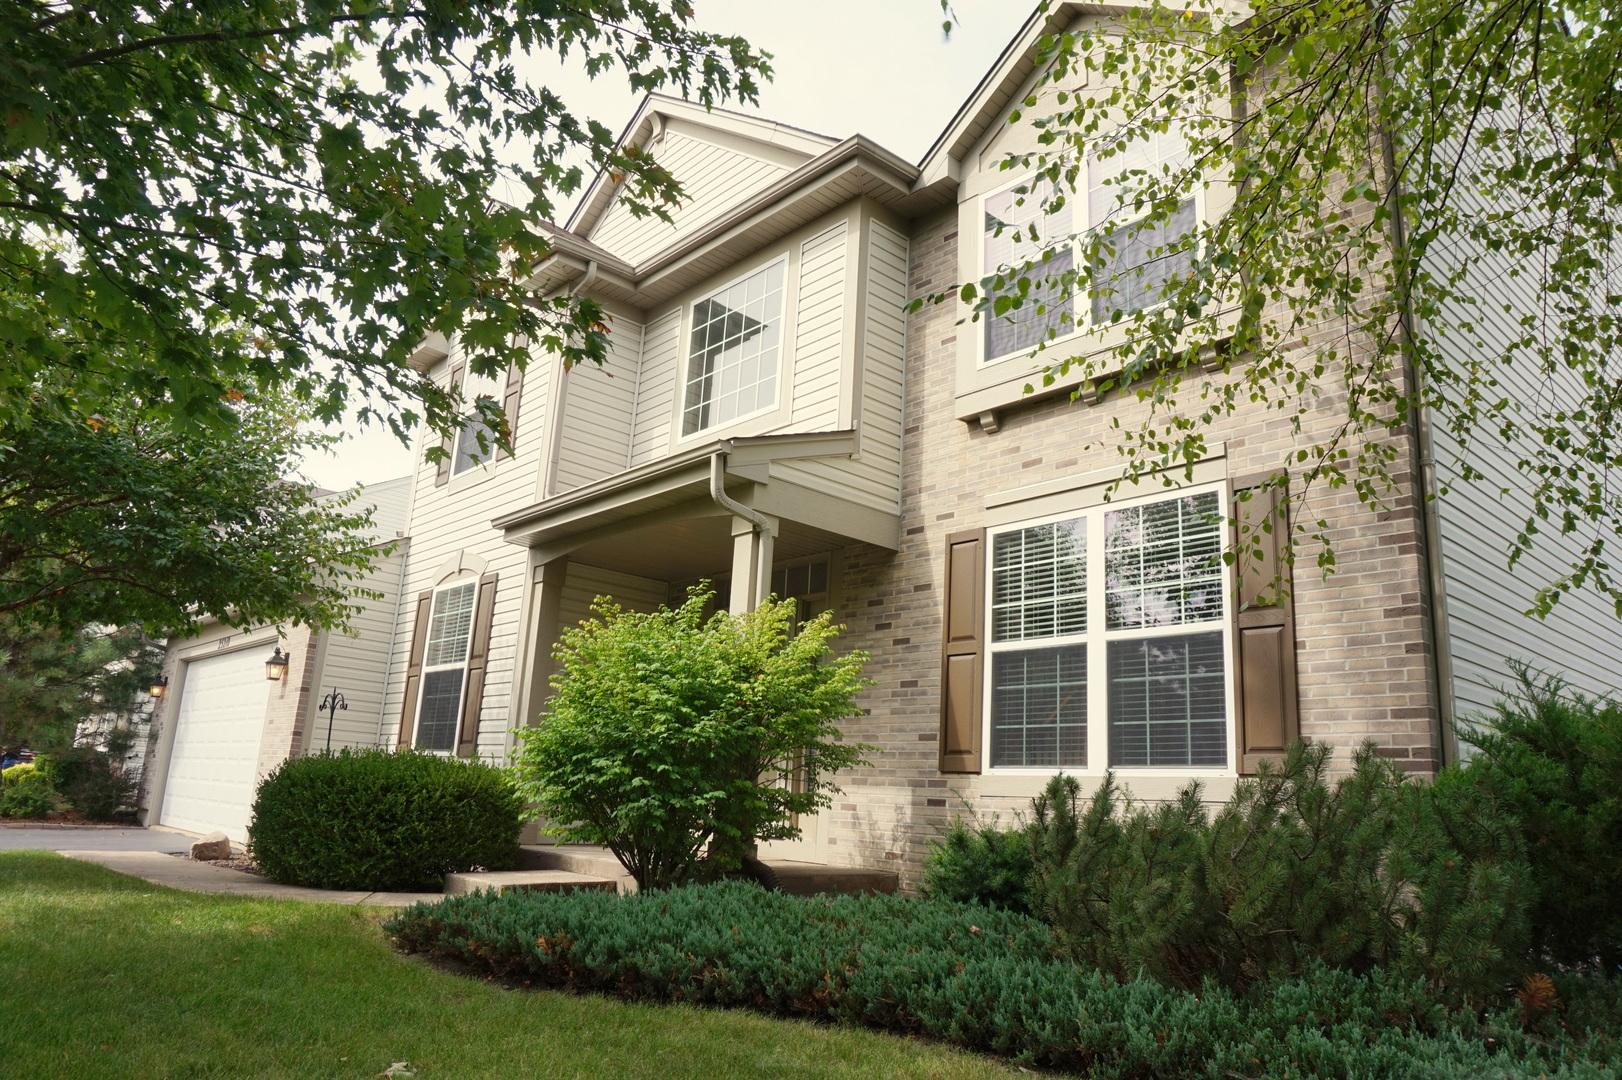 25210 PASTORAL PLAINFIELD Illinois Homes for sale